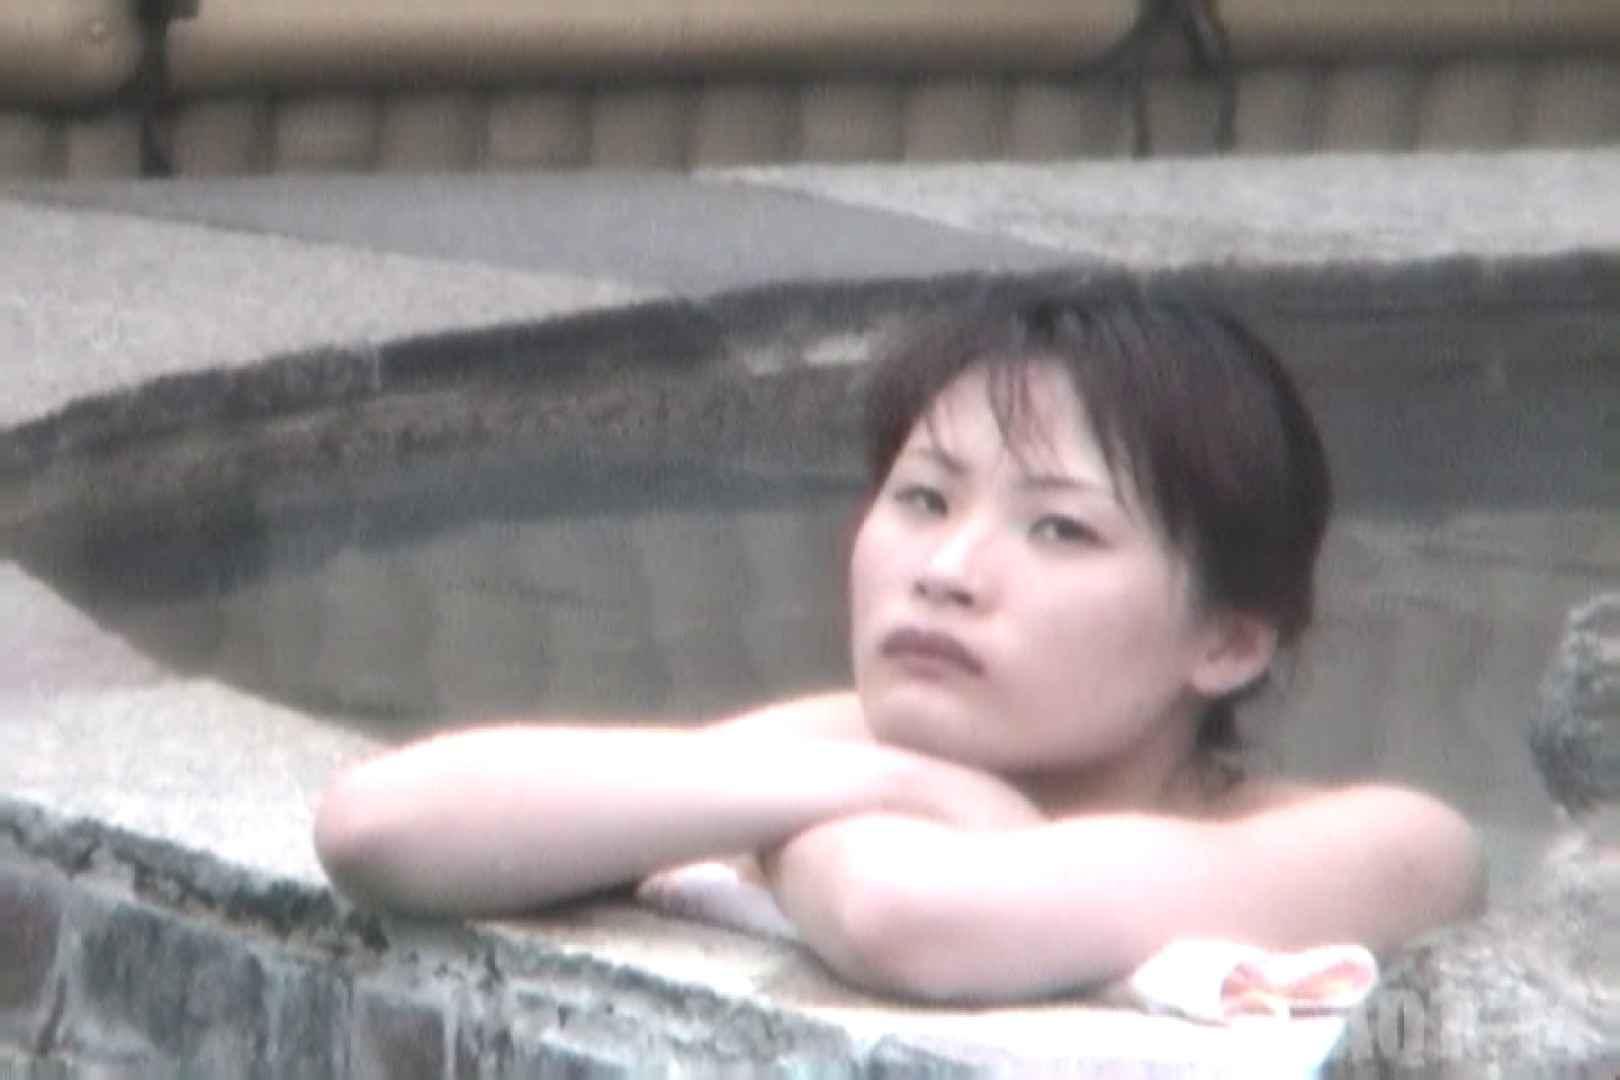 Aquaな露天風呂Vol.822 盗撮 オメコ無修正動画無料 62連発 20